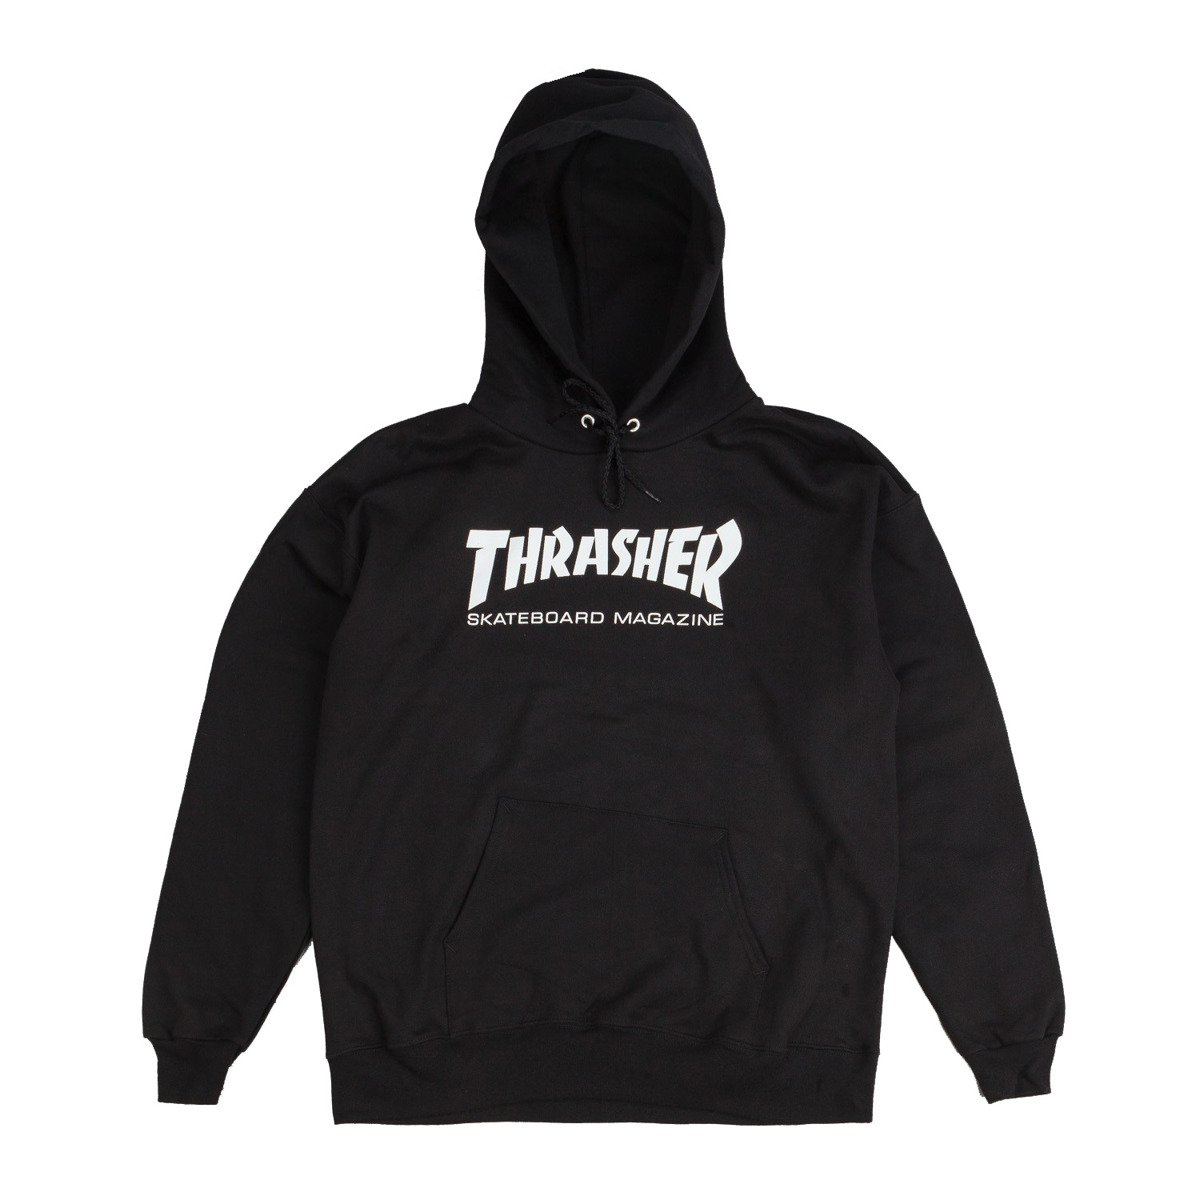 ff20147c2617 thrasher skate mag logo hoodie black